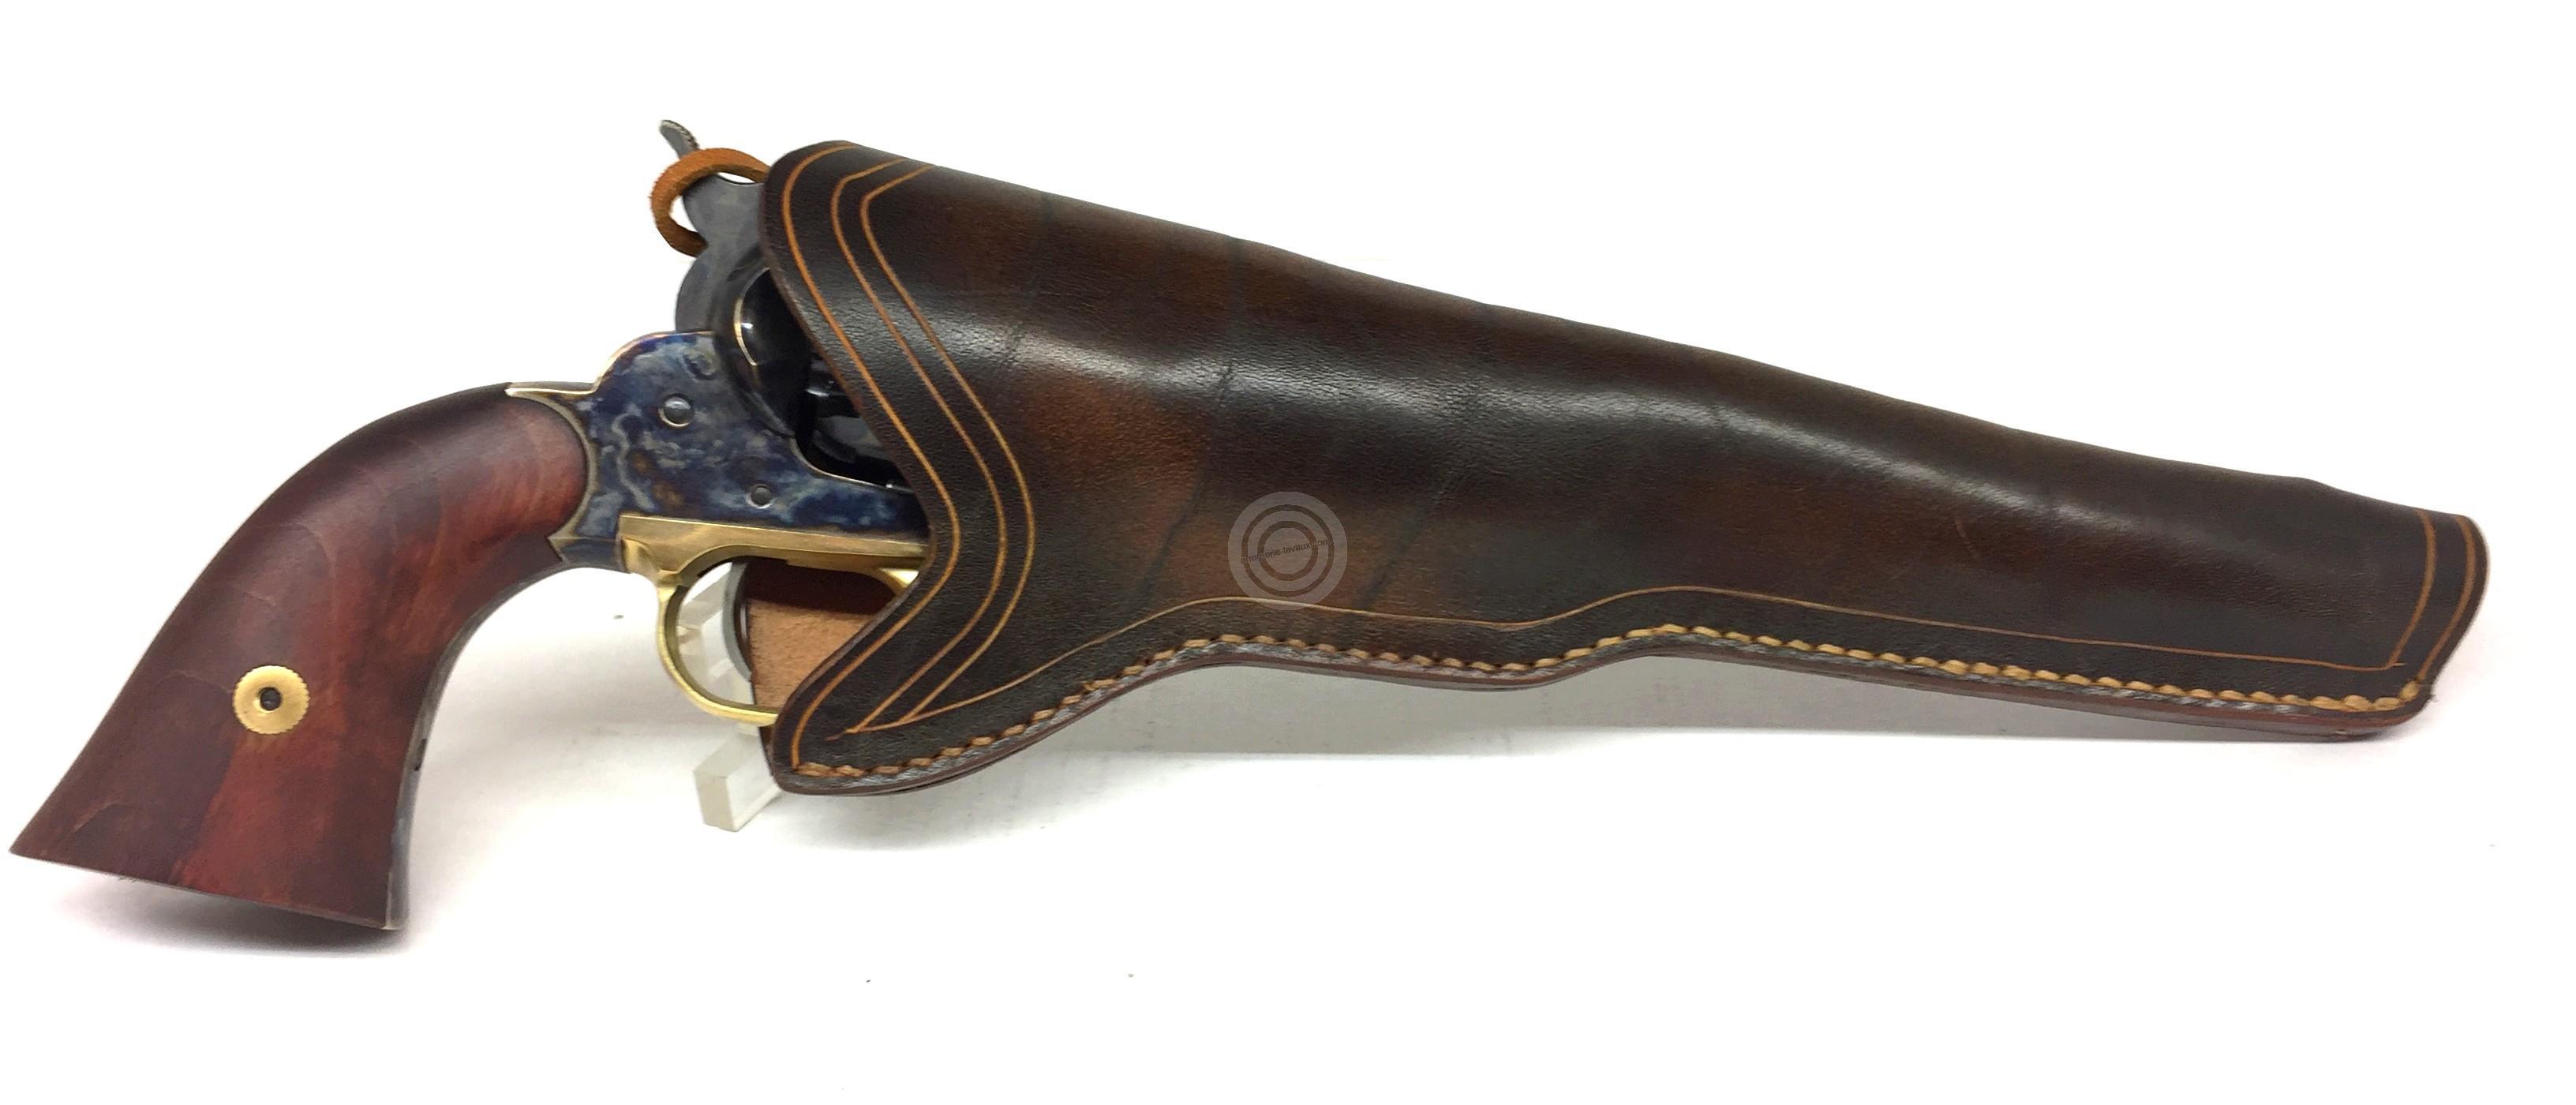 16ce4a86765 Holster en cuir Western pour revolver 8